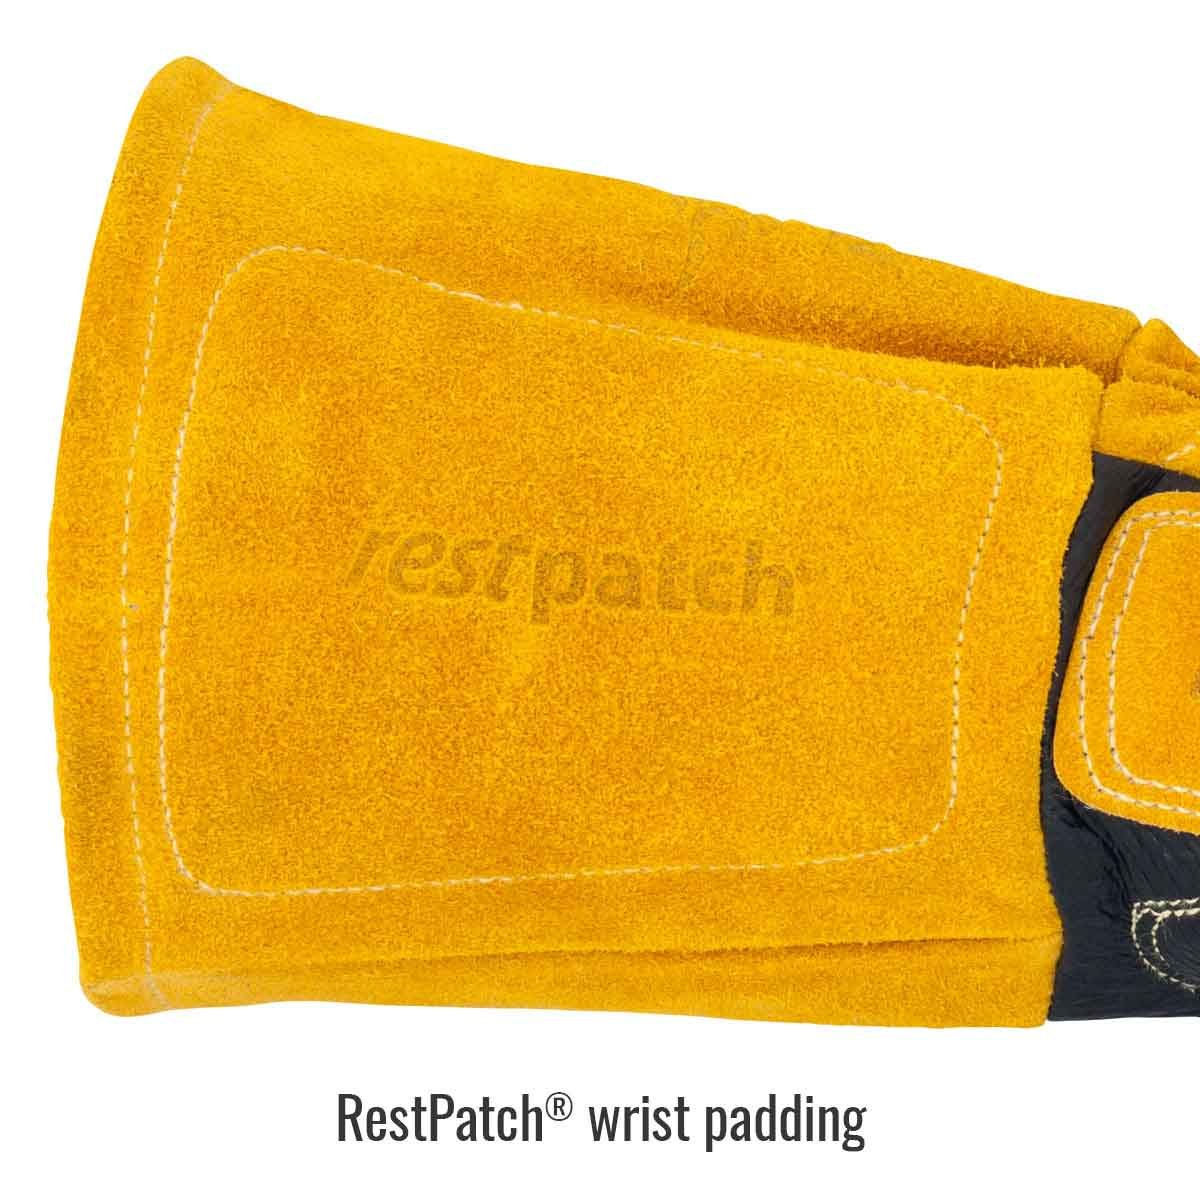 Black Stallion BM88CR Pigskin /& Cowhide MIG Glove with A5 Cut Resistan